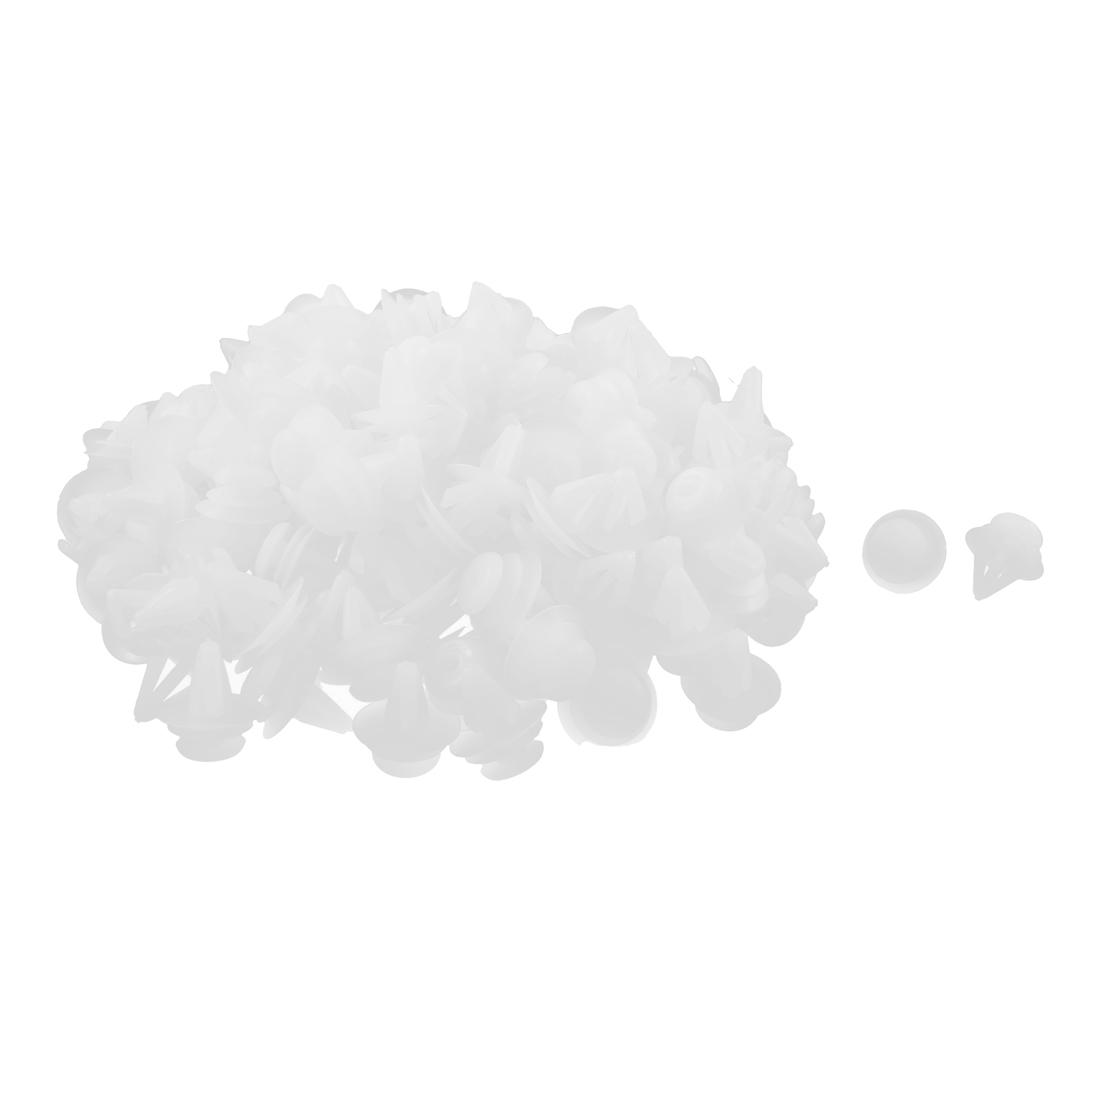 200 Pcs White Plastic Rivet Trim Fastener Retainer Clips 12mm x 15mm x 20mm